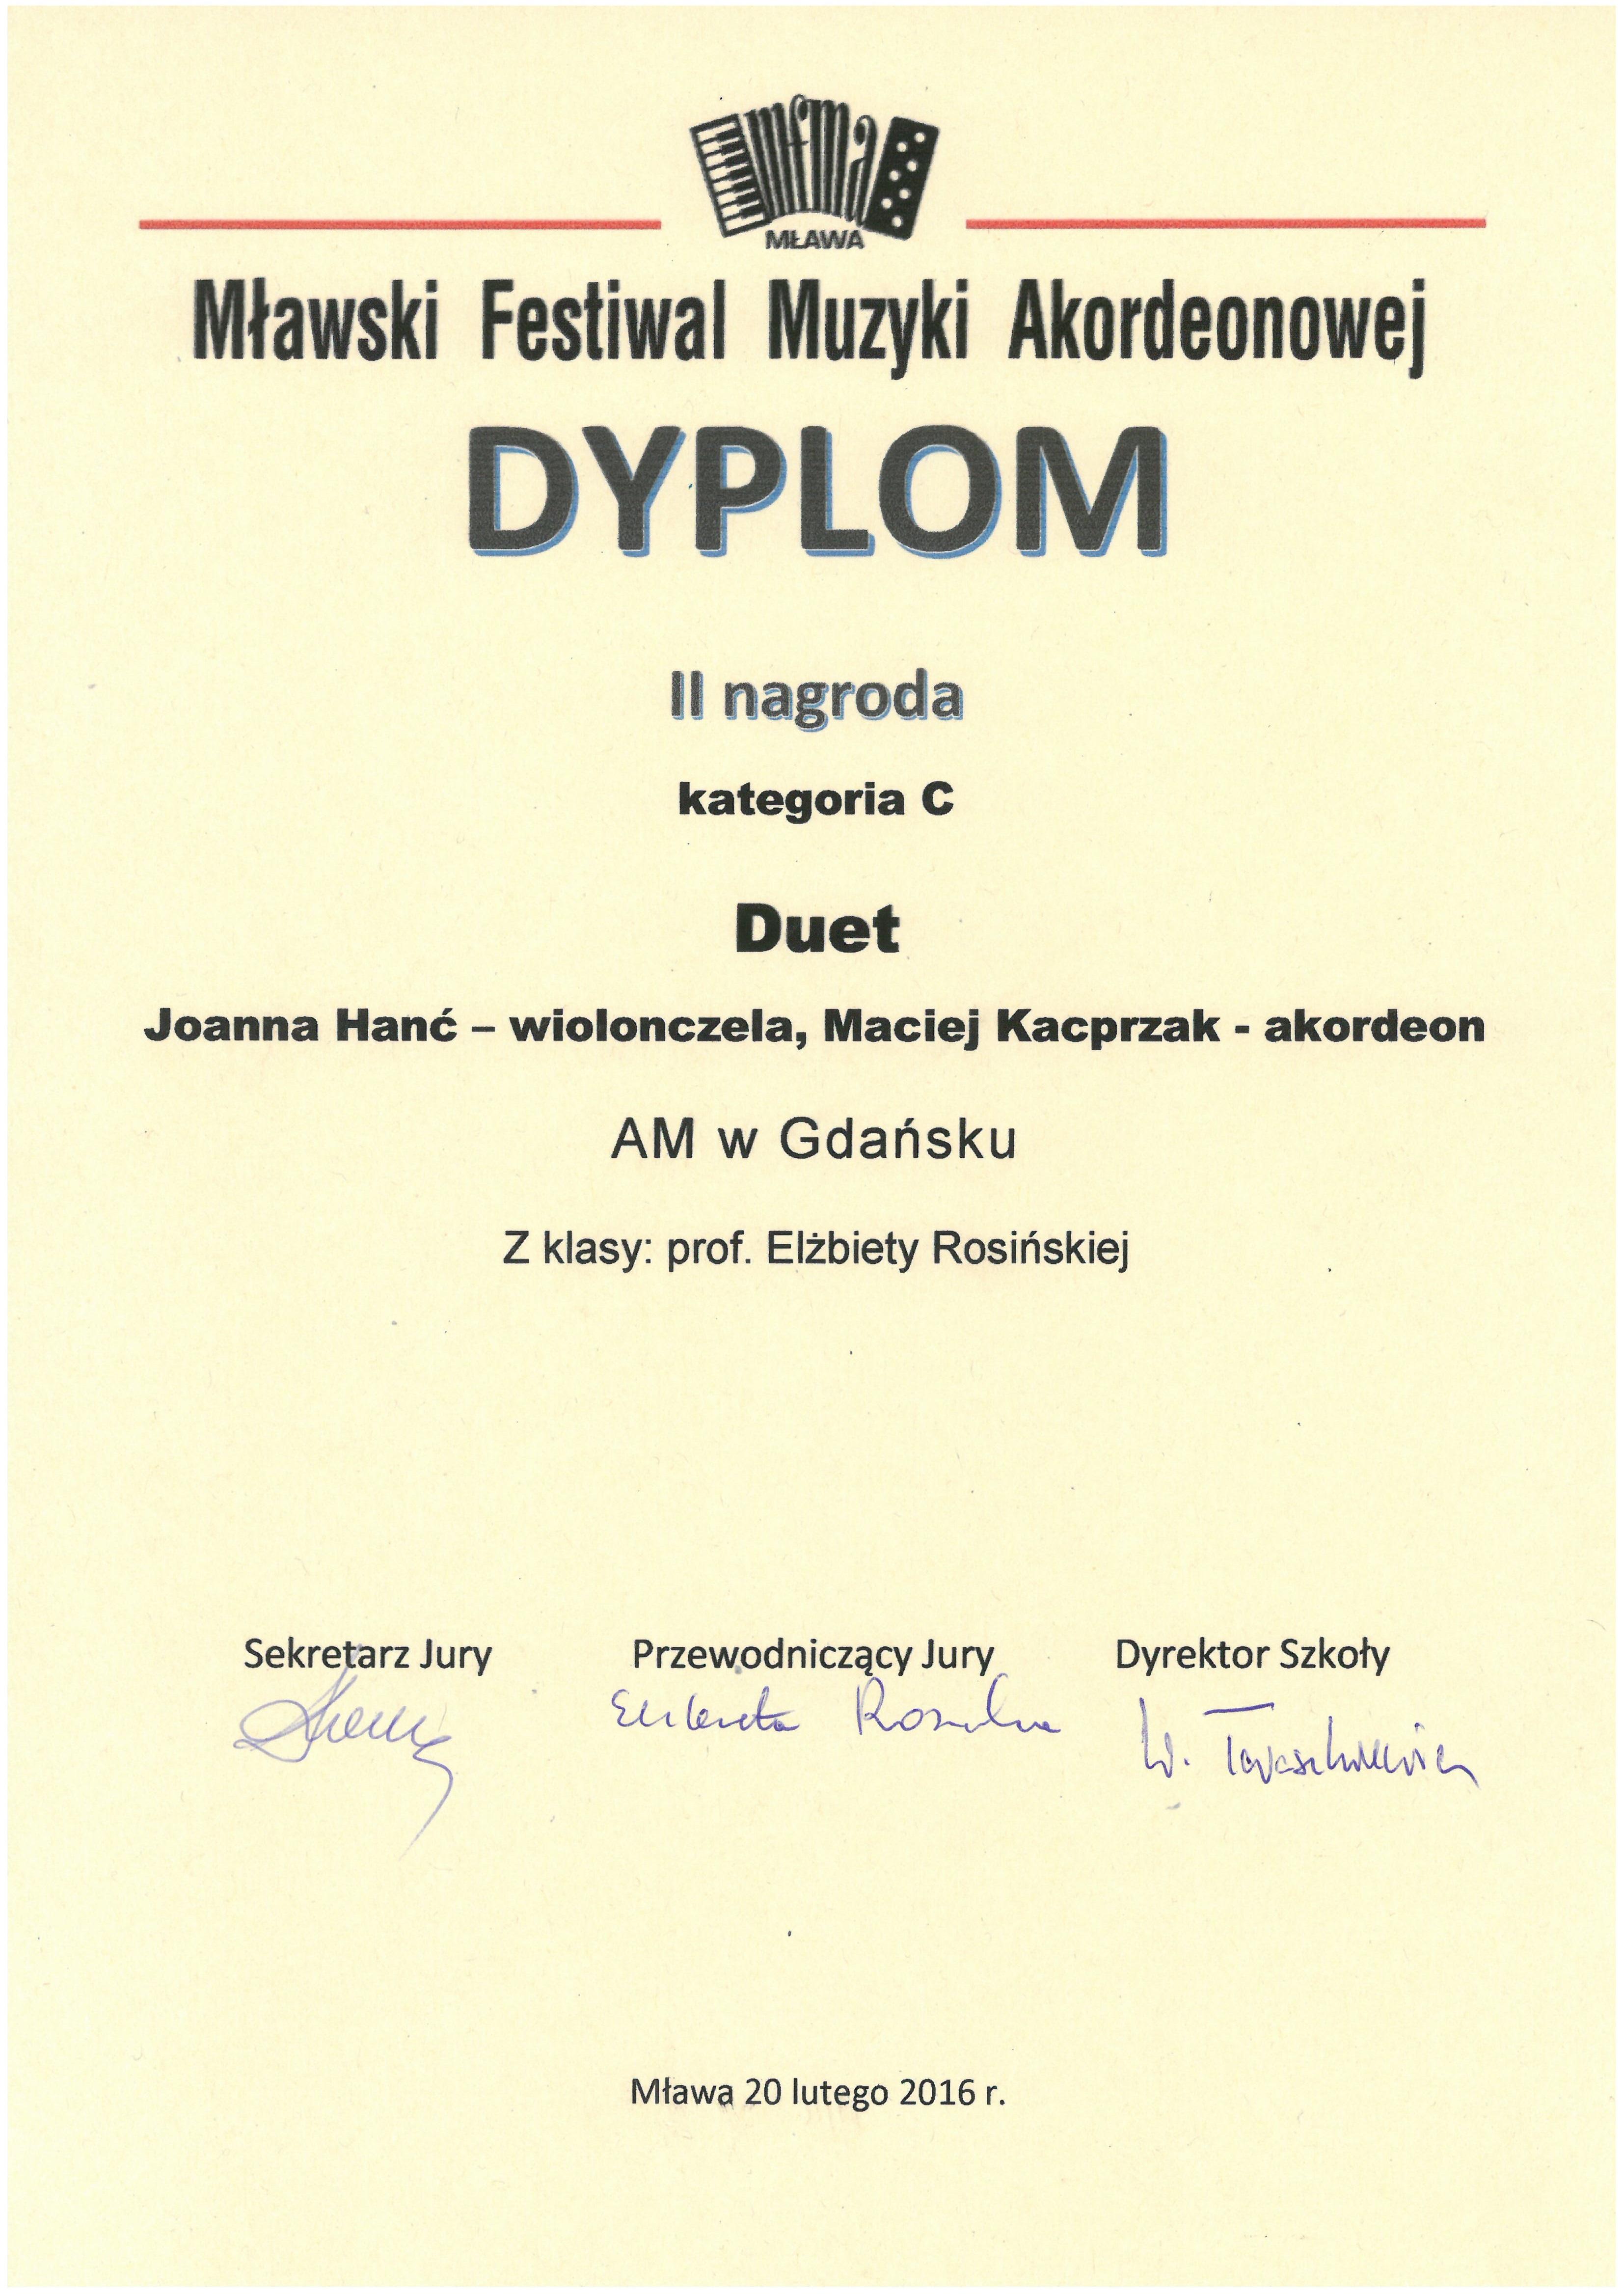 Duet_Hanc-Kacprzak_II nagroda_MFMA_2016